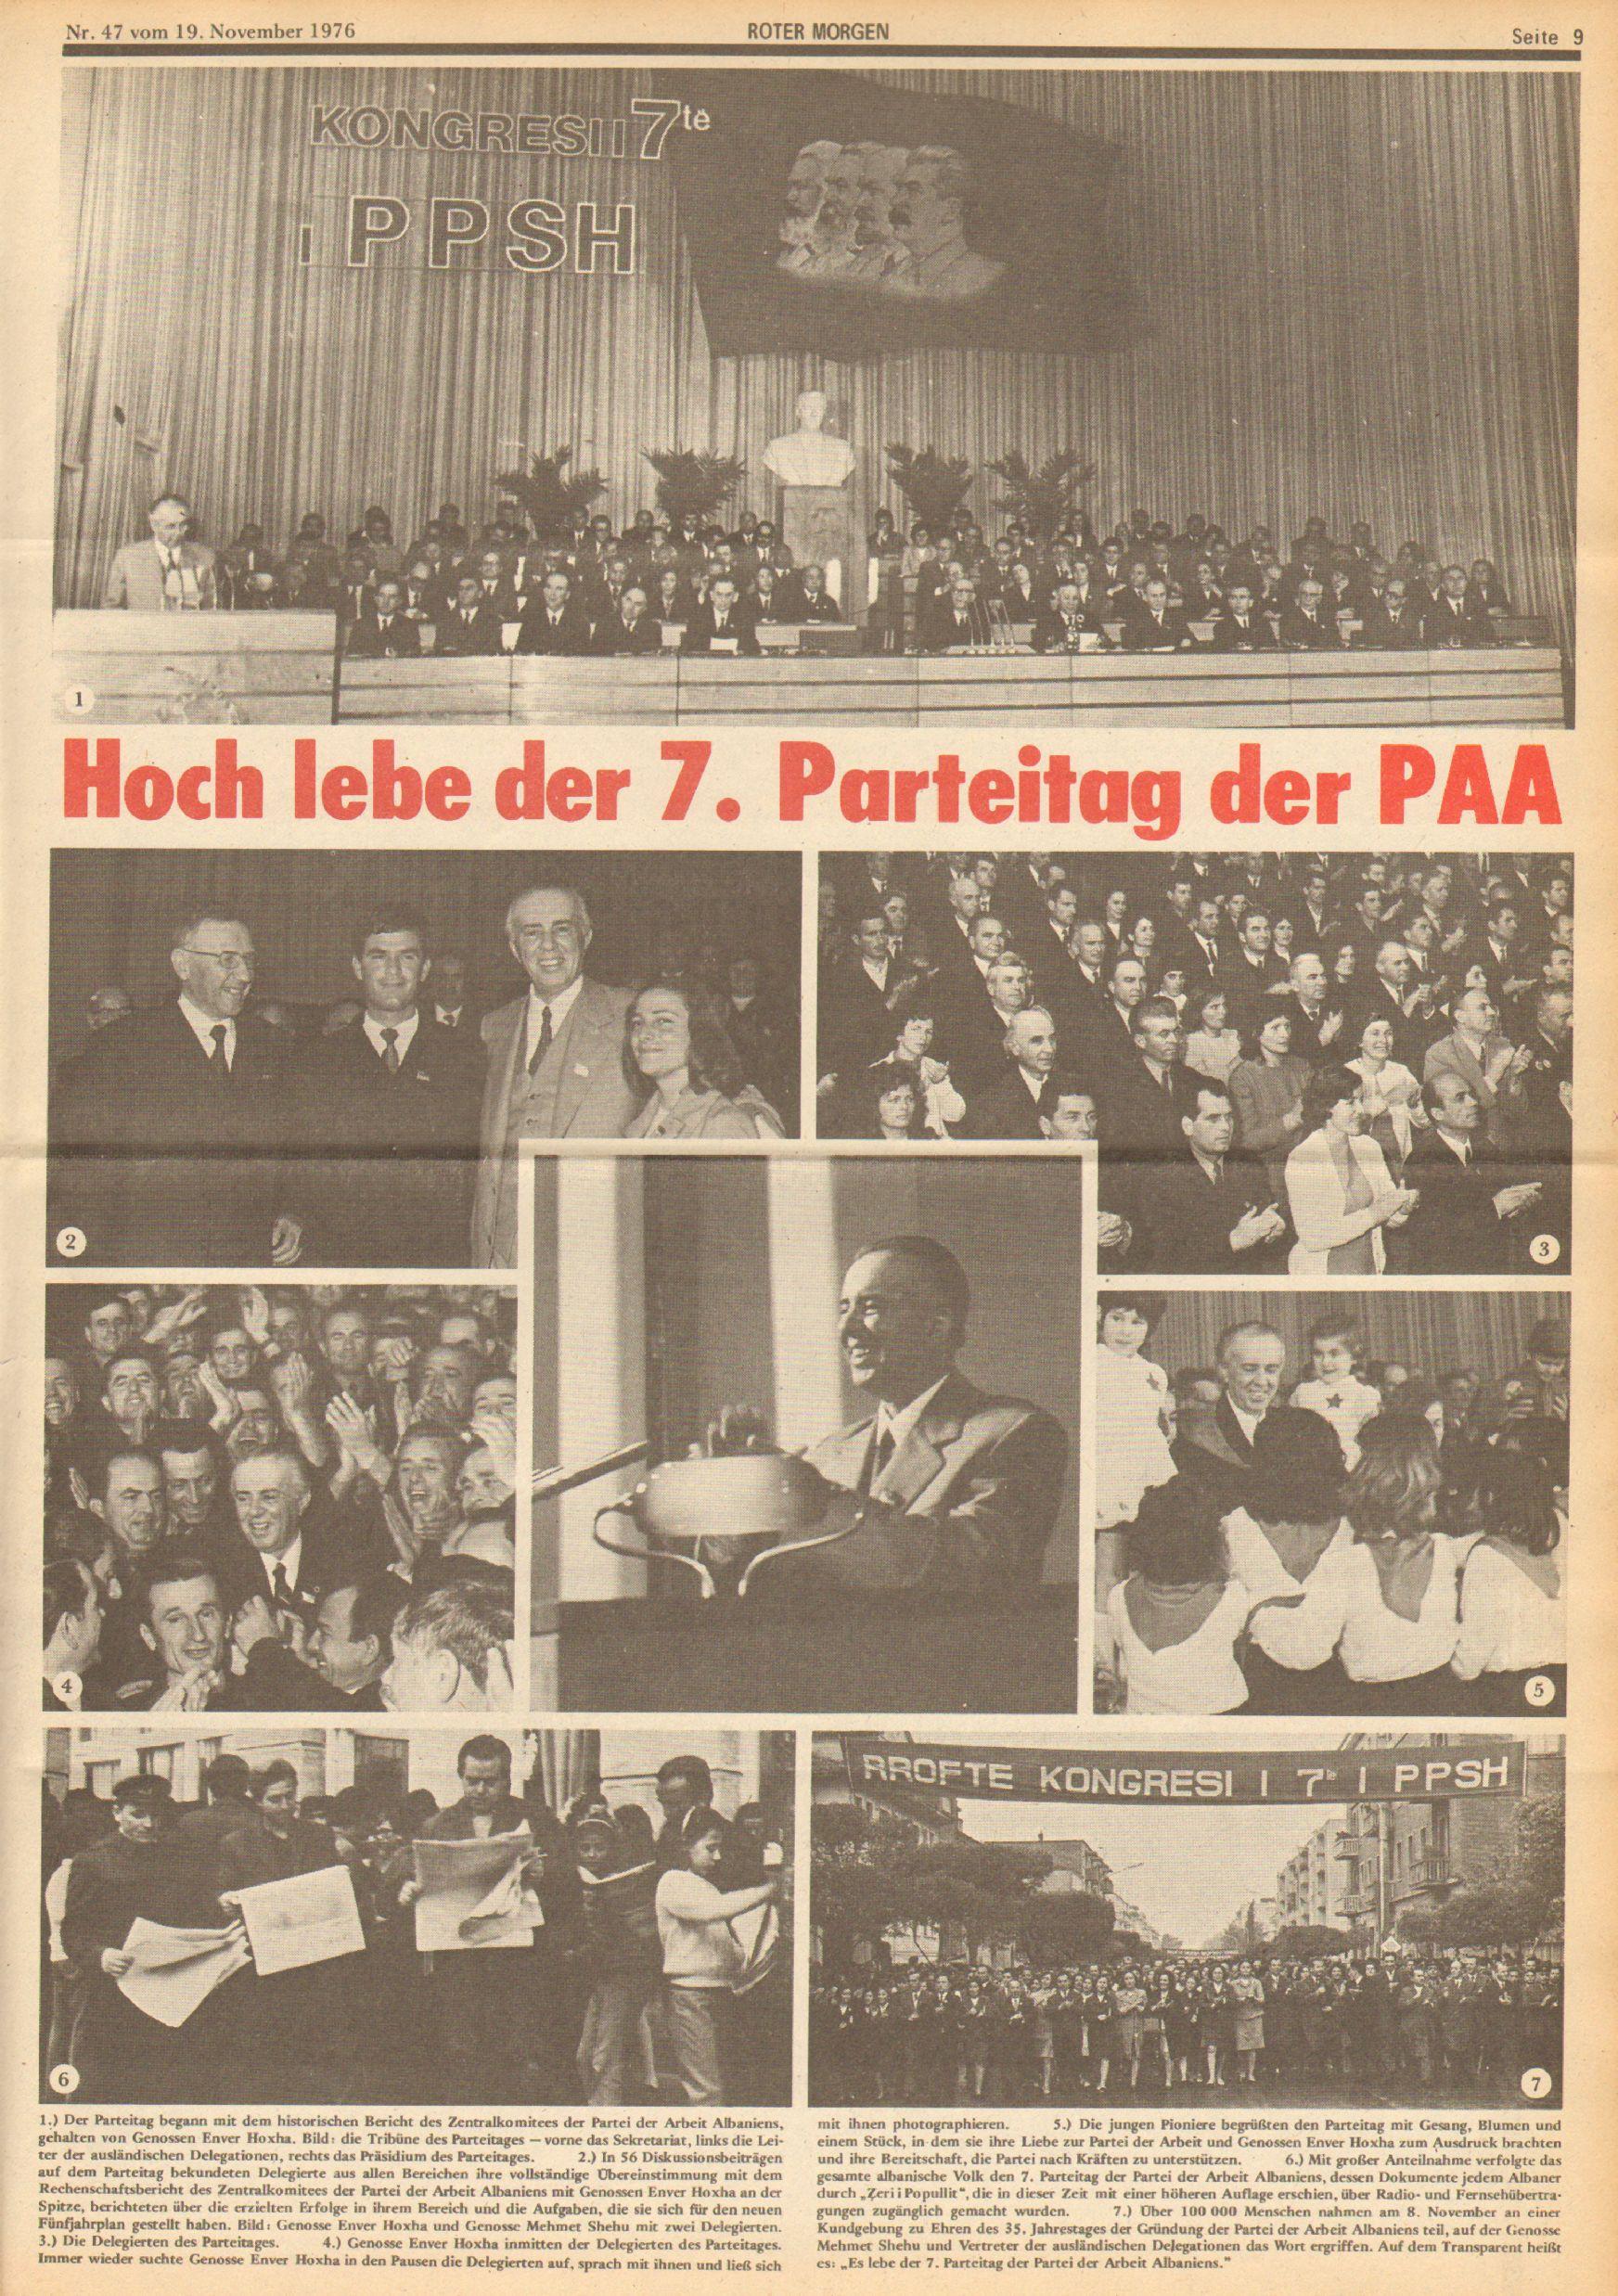 Roter Morgen, 10. Jg., 19. November 1976, Nr. 47, Seite 9